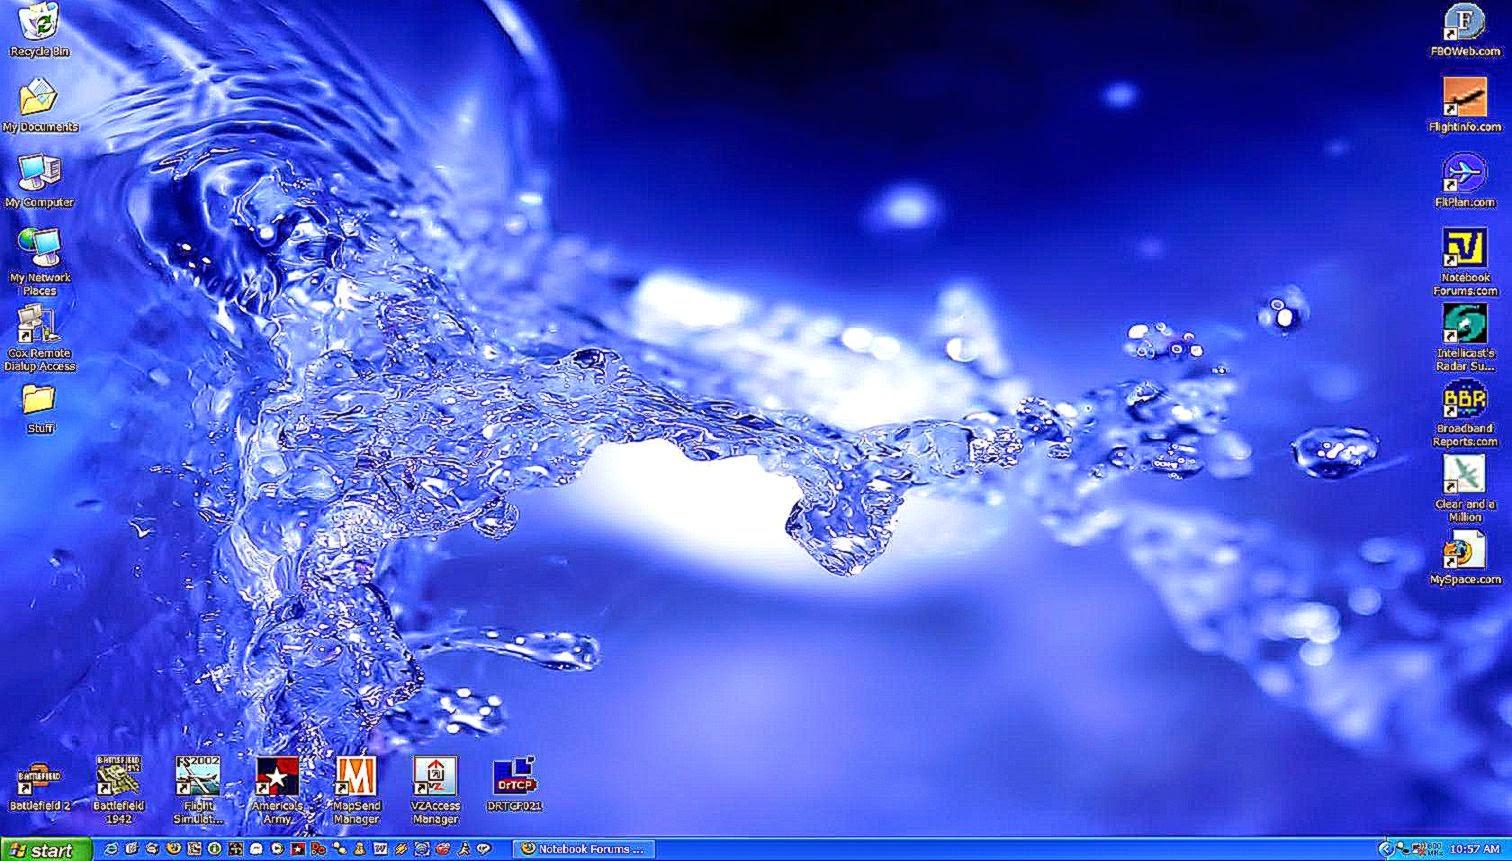 dell desktop laptop computers wallpaper | best free hd wallpaper